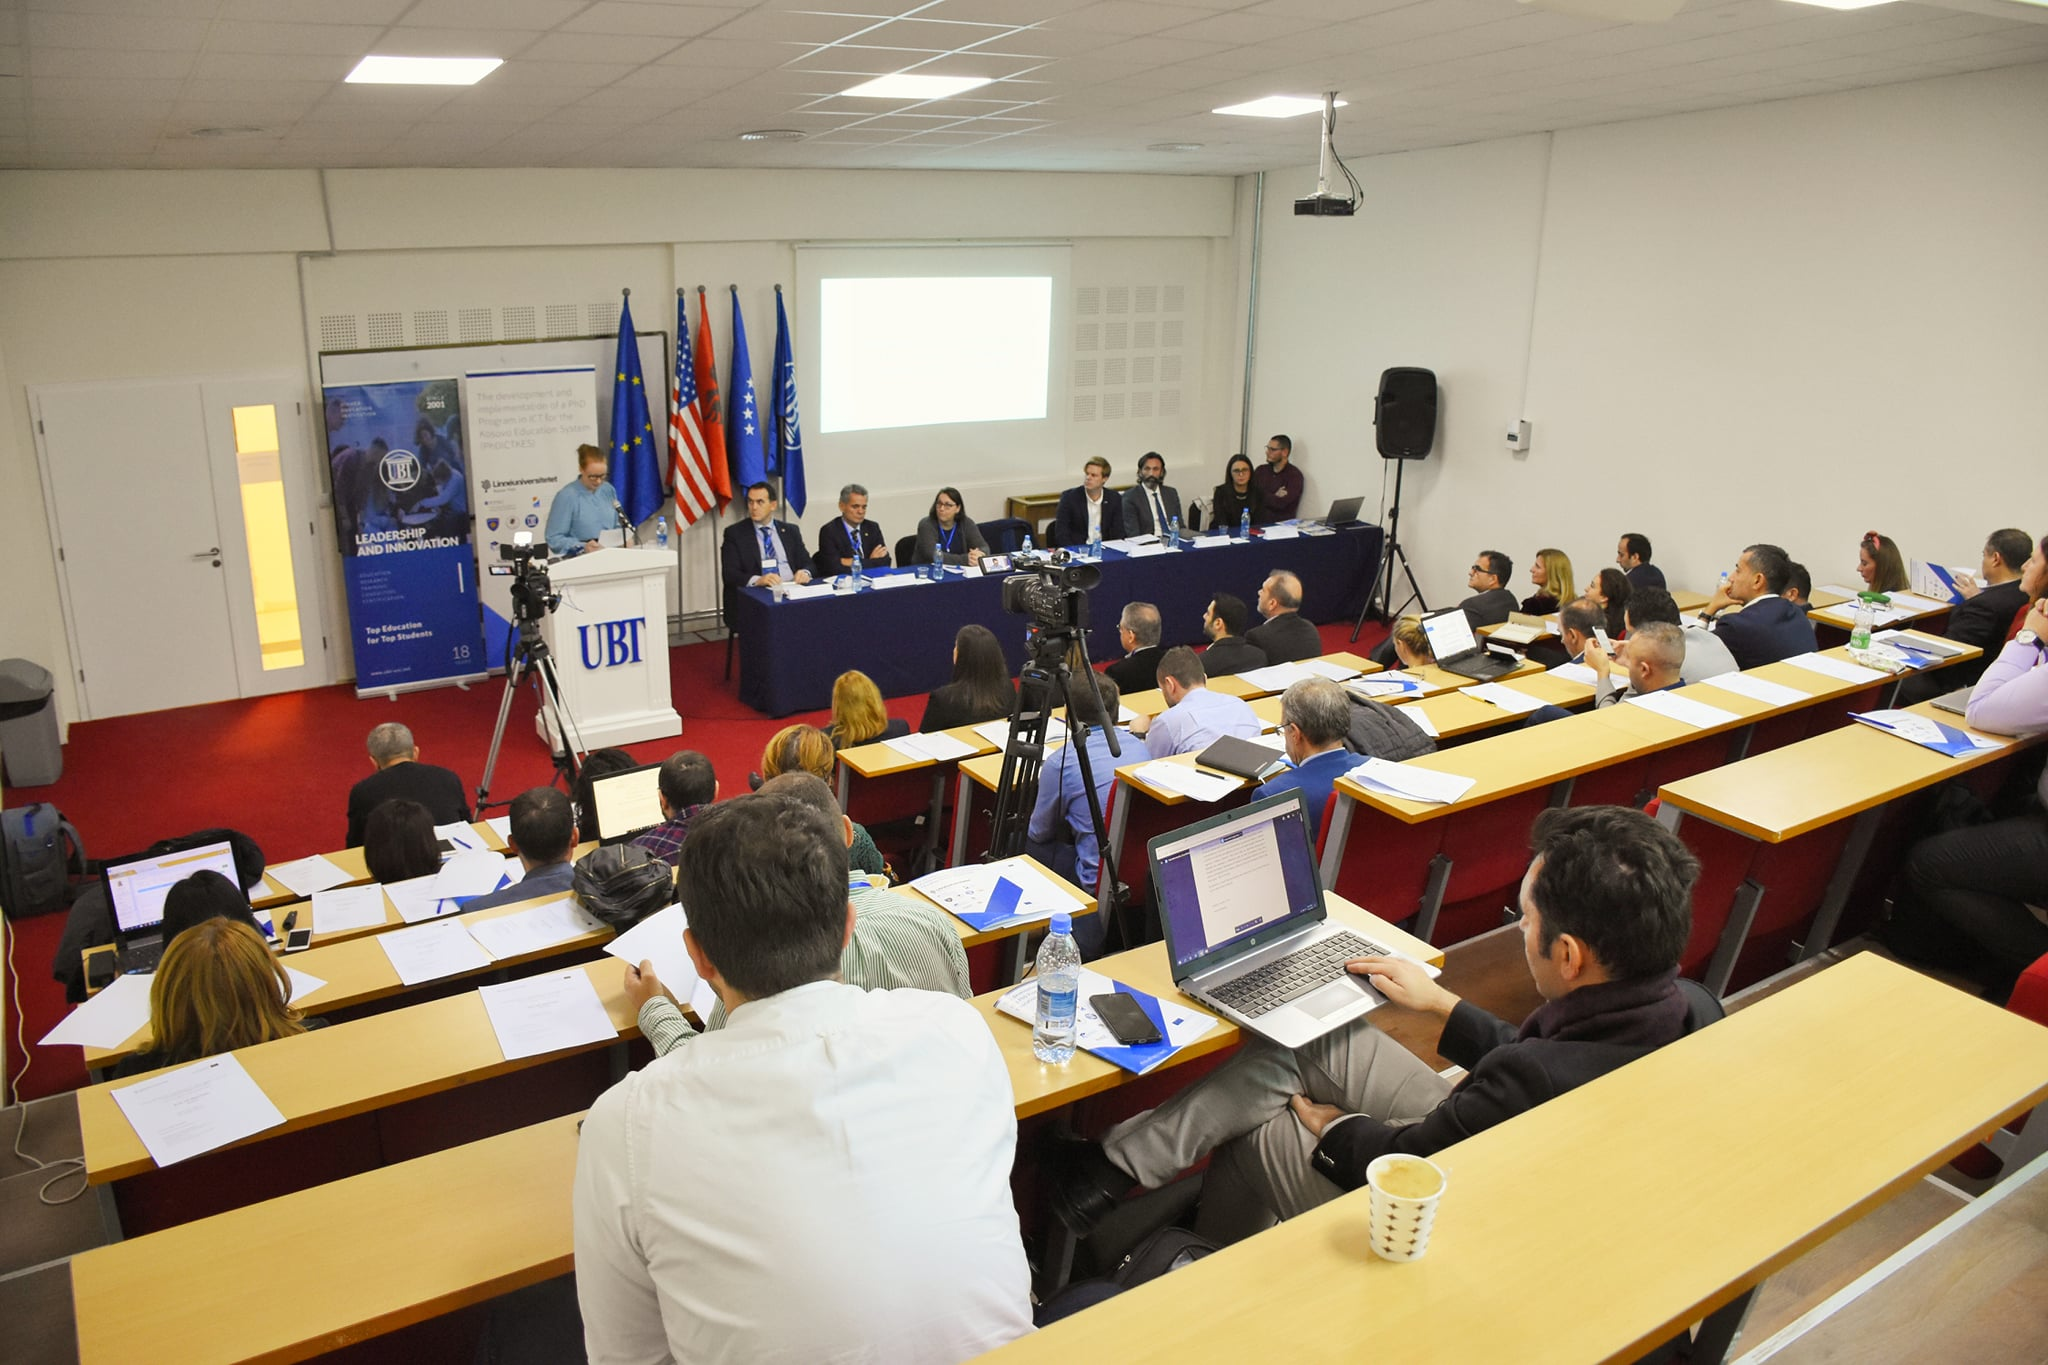 Kosbit to take part in Linnaeus University PhD project